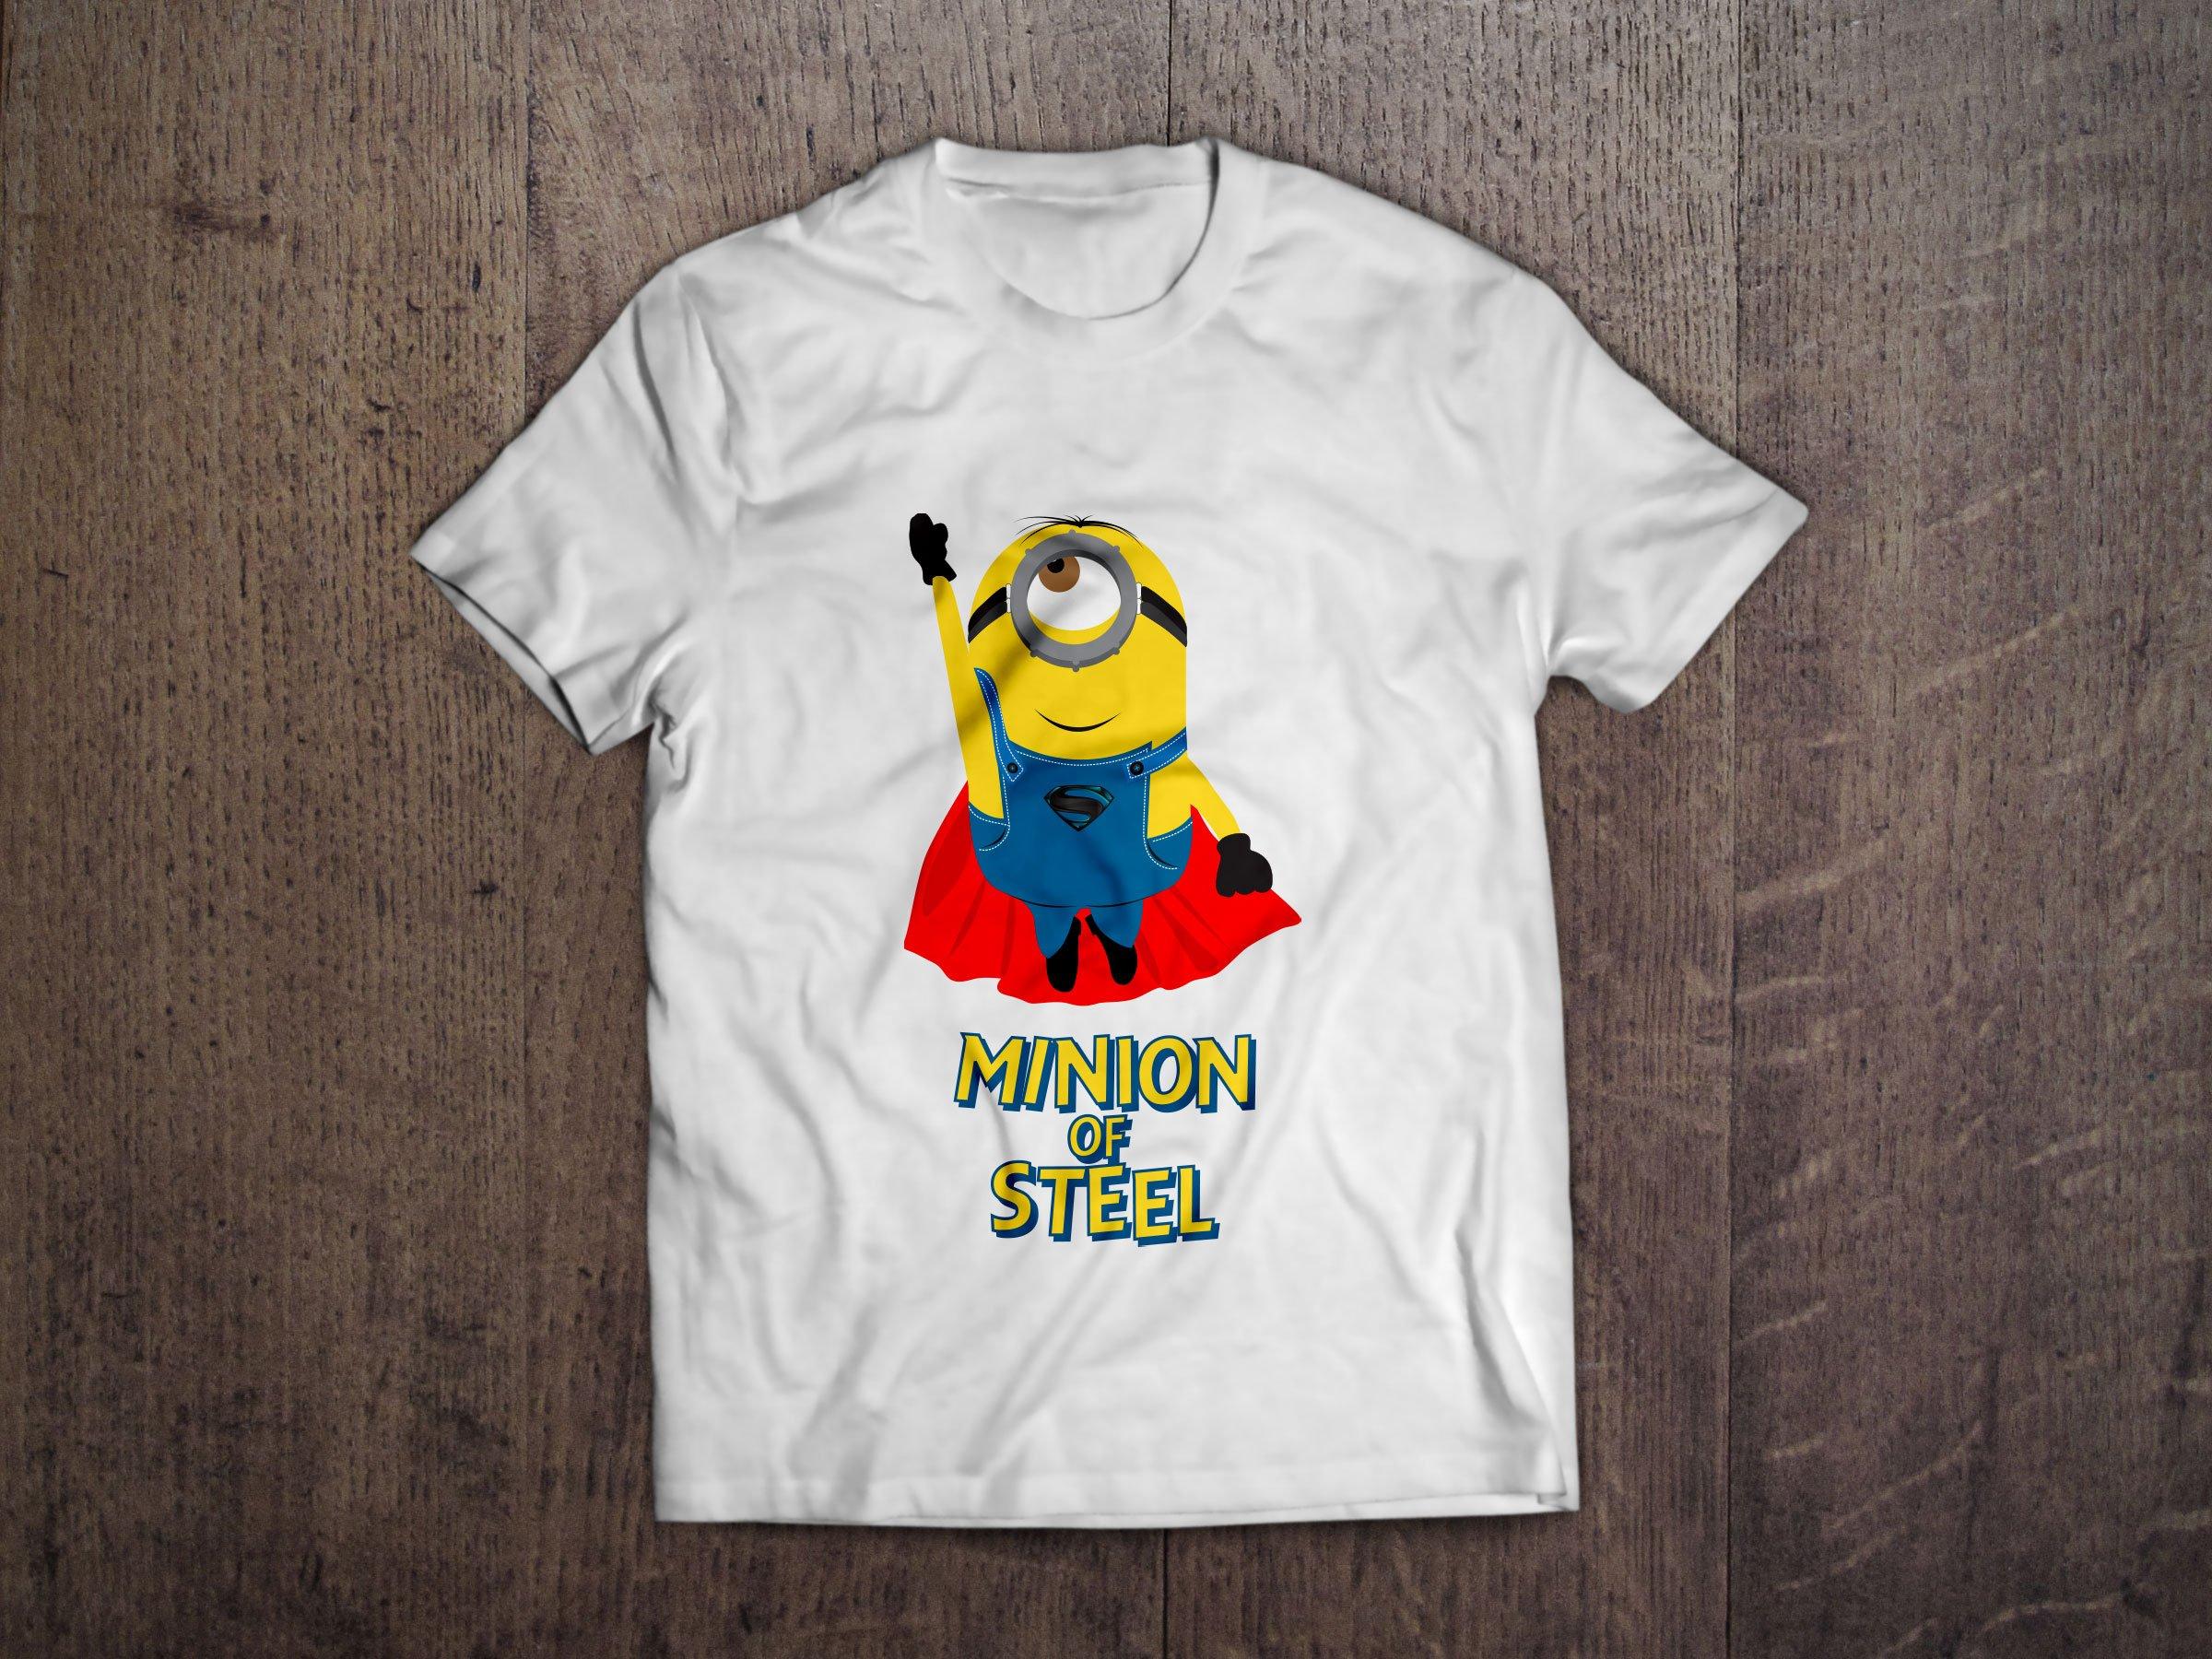 Shirt design eps -  Minion T Shirts Design 3